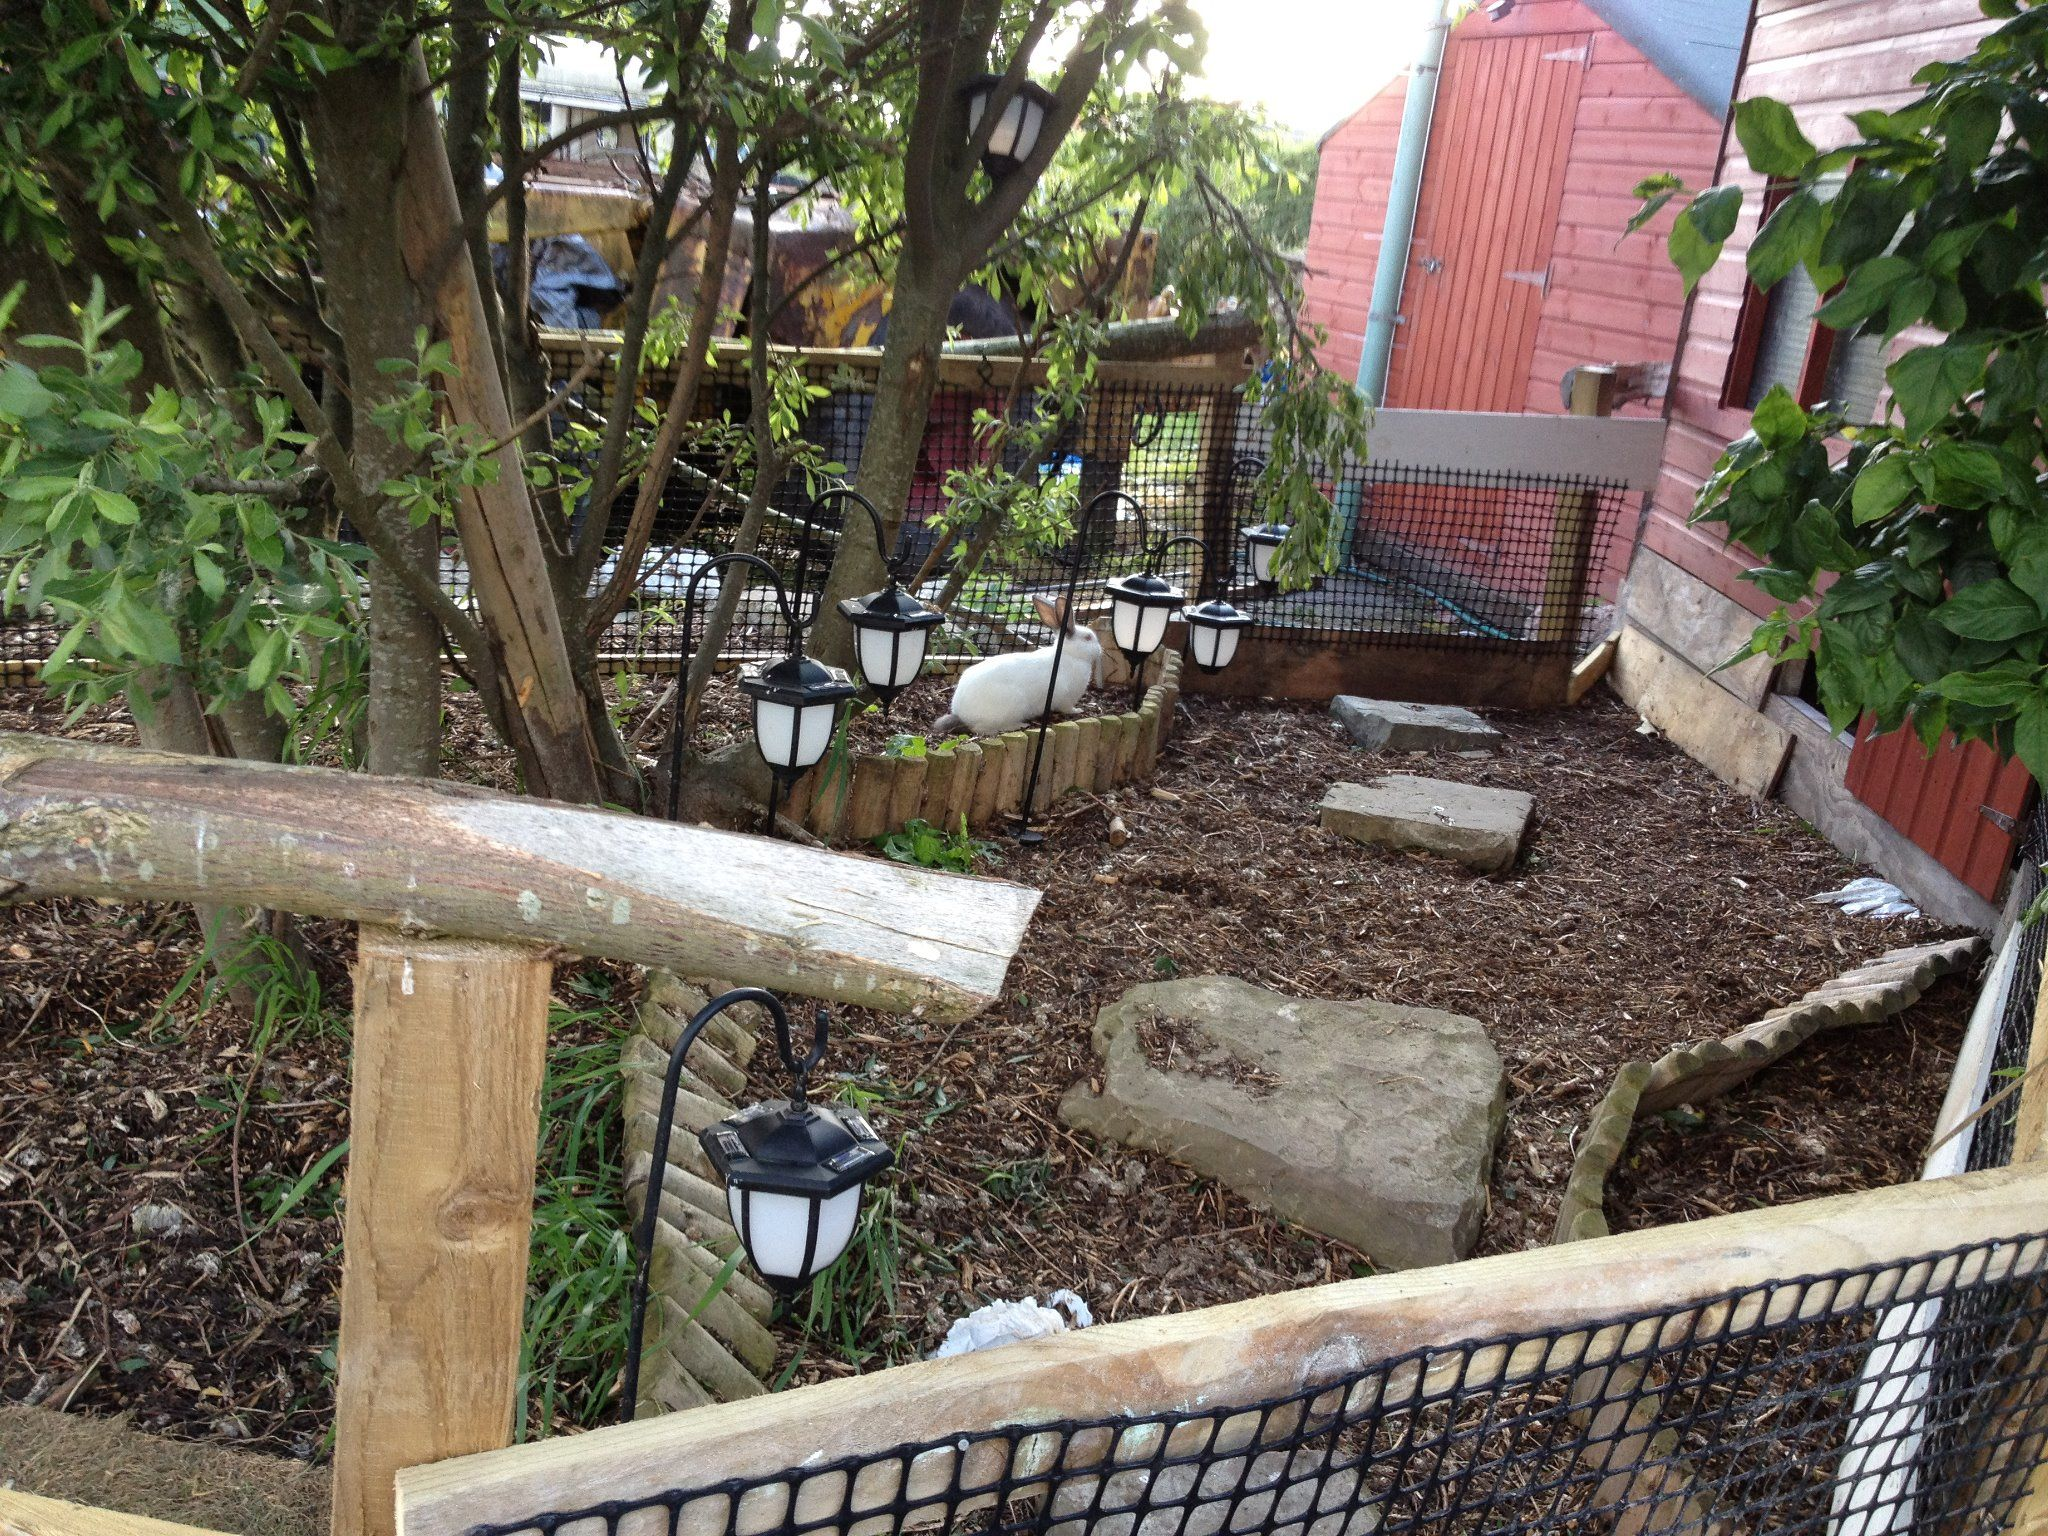 Buitenren konijnenheuvel huisvesting bunnybunch forums for Outdoor rabbit enclosure ideas